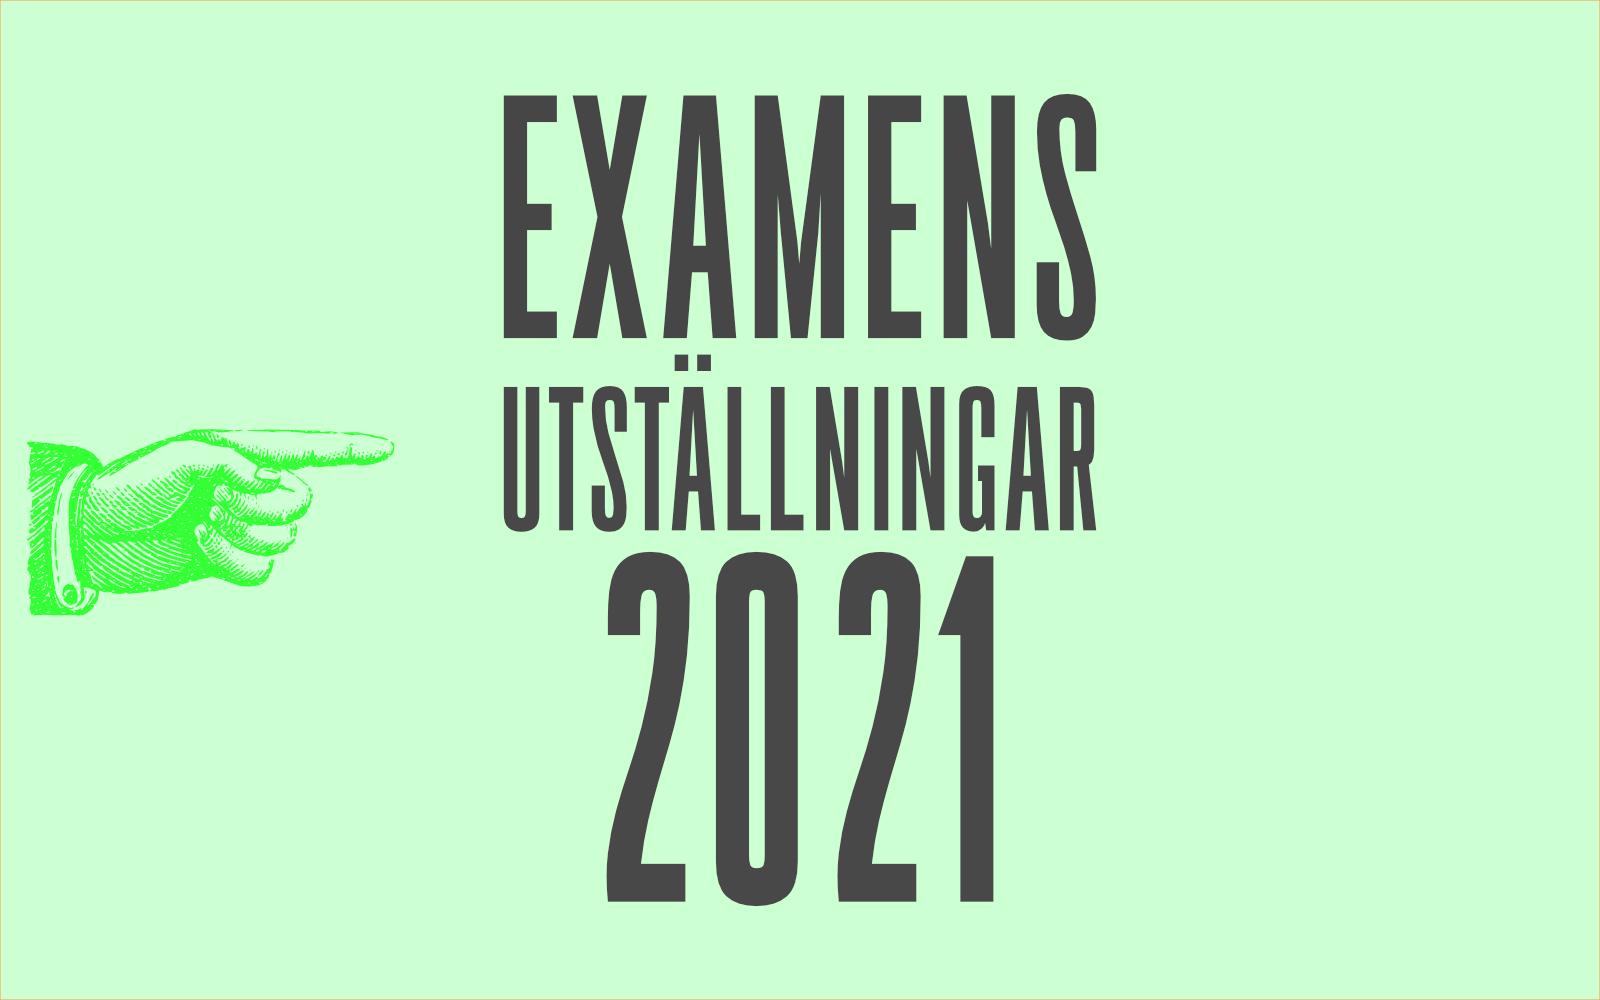 Examensutställningar 2021. Grafik: Lamin Kivelä.